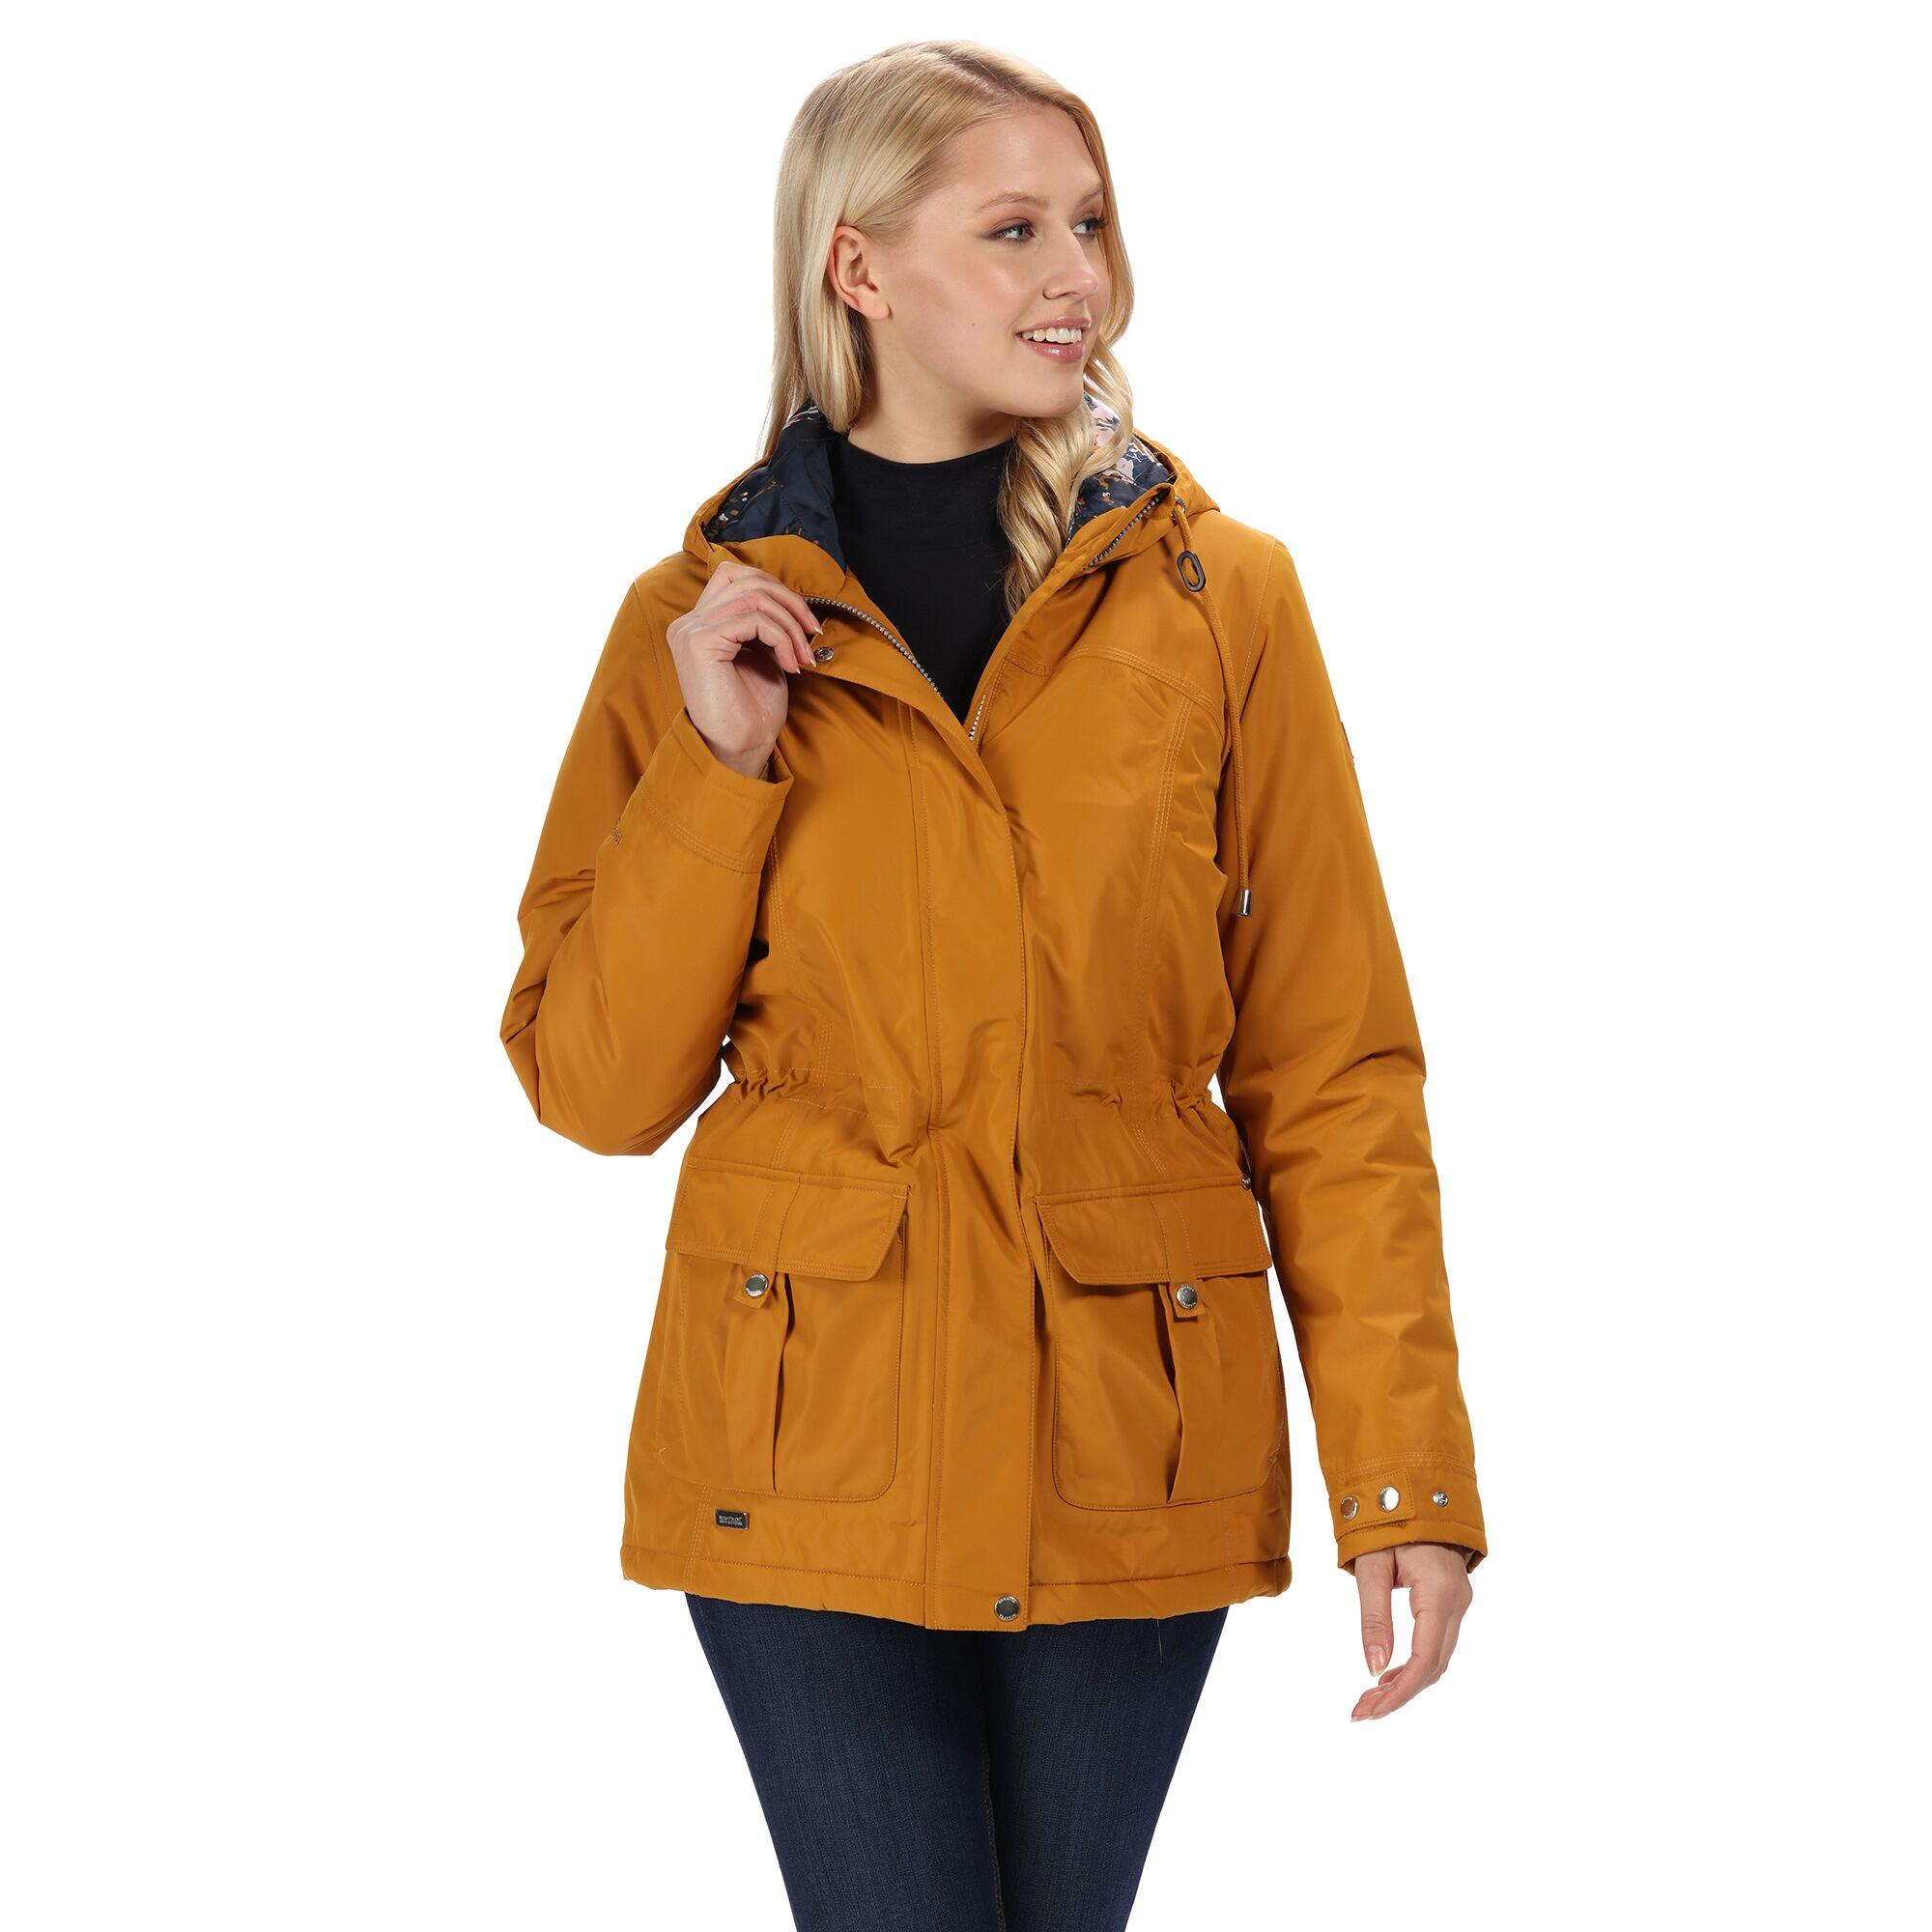 Regatta-Womens-Ladies-Braelynn-Long-Length-Waterproof-Jacket-RG4552 thumbnail 15